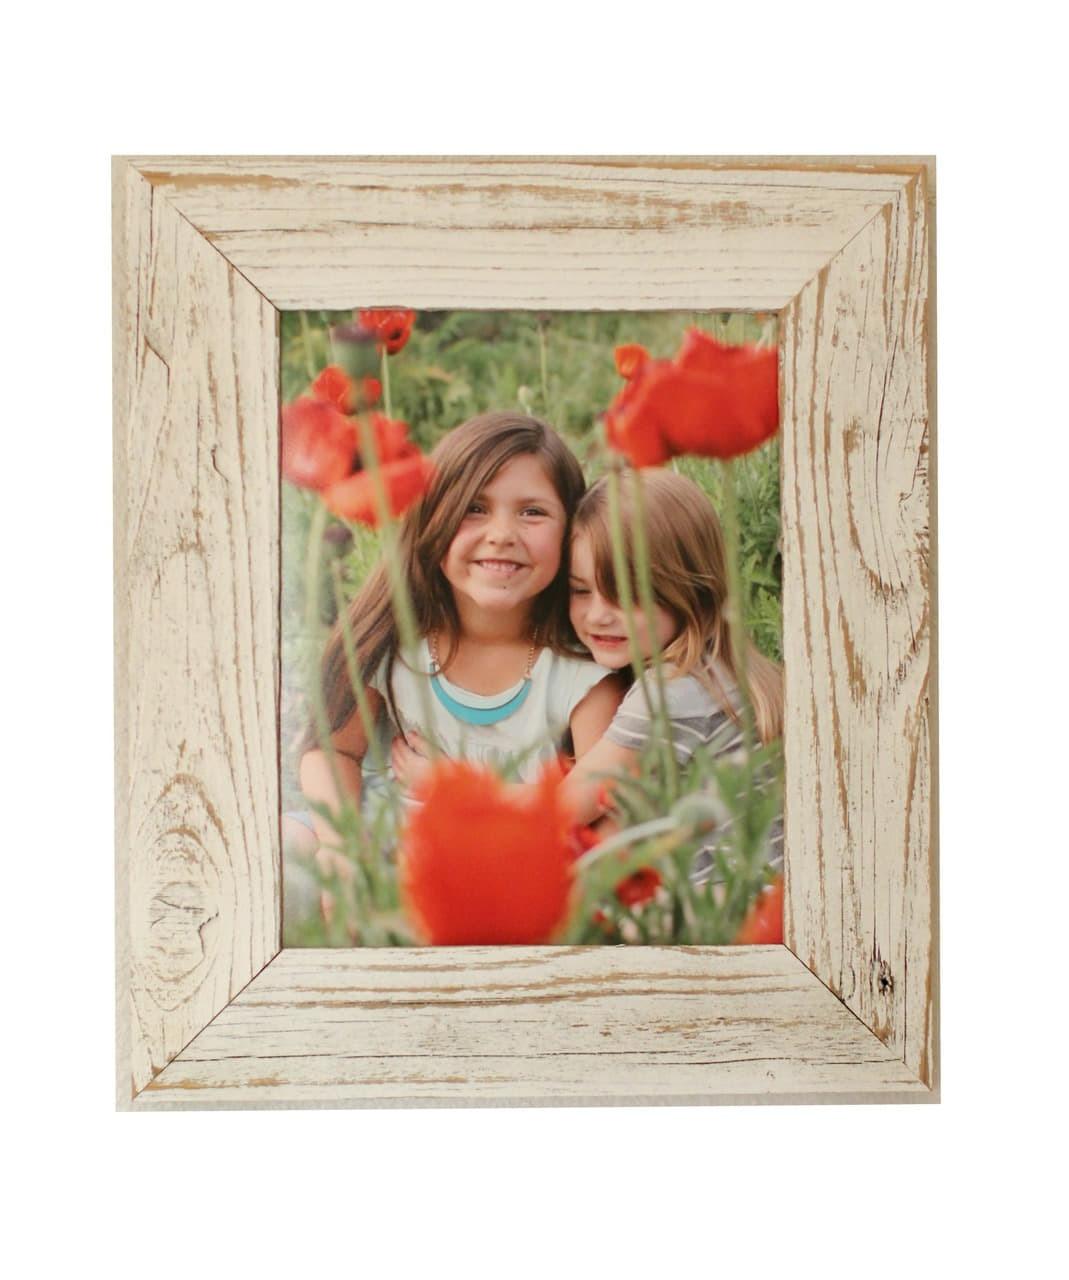 8x10 Antique White Barnwood Picture Frame Whitewashed Reclaimed Wood